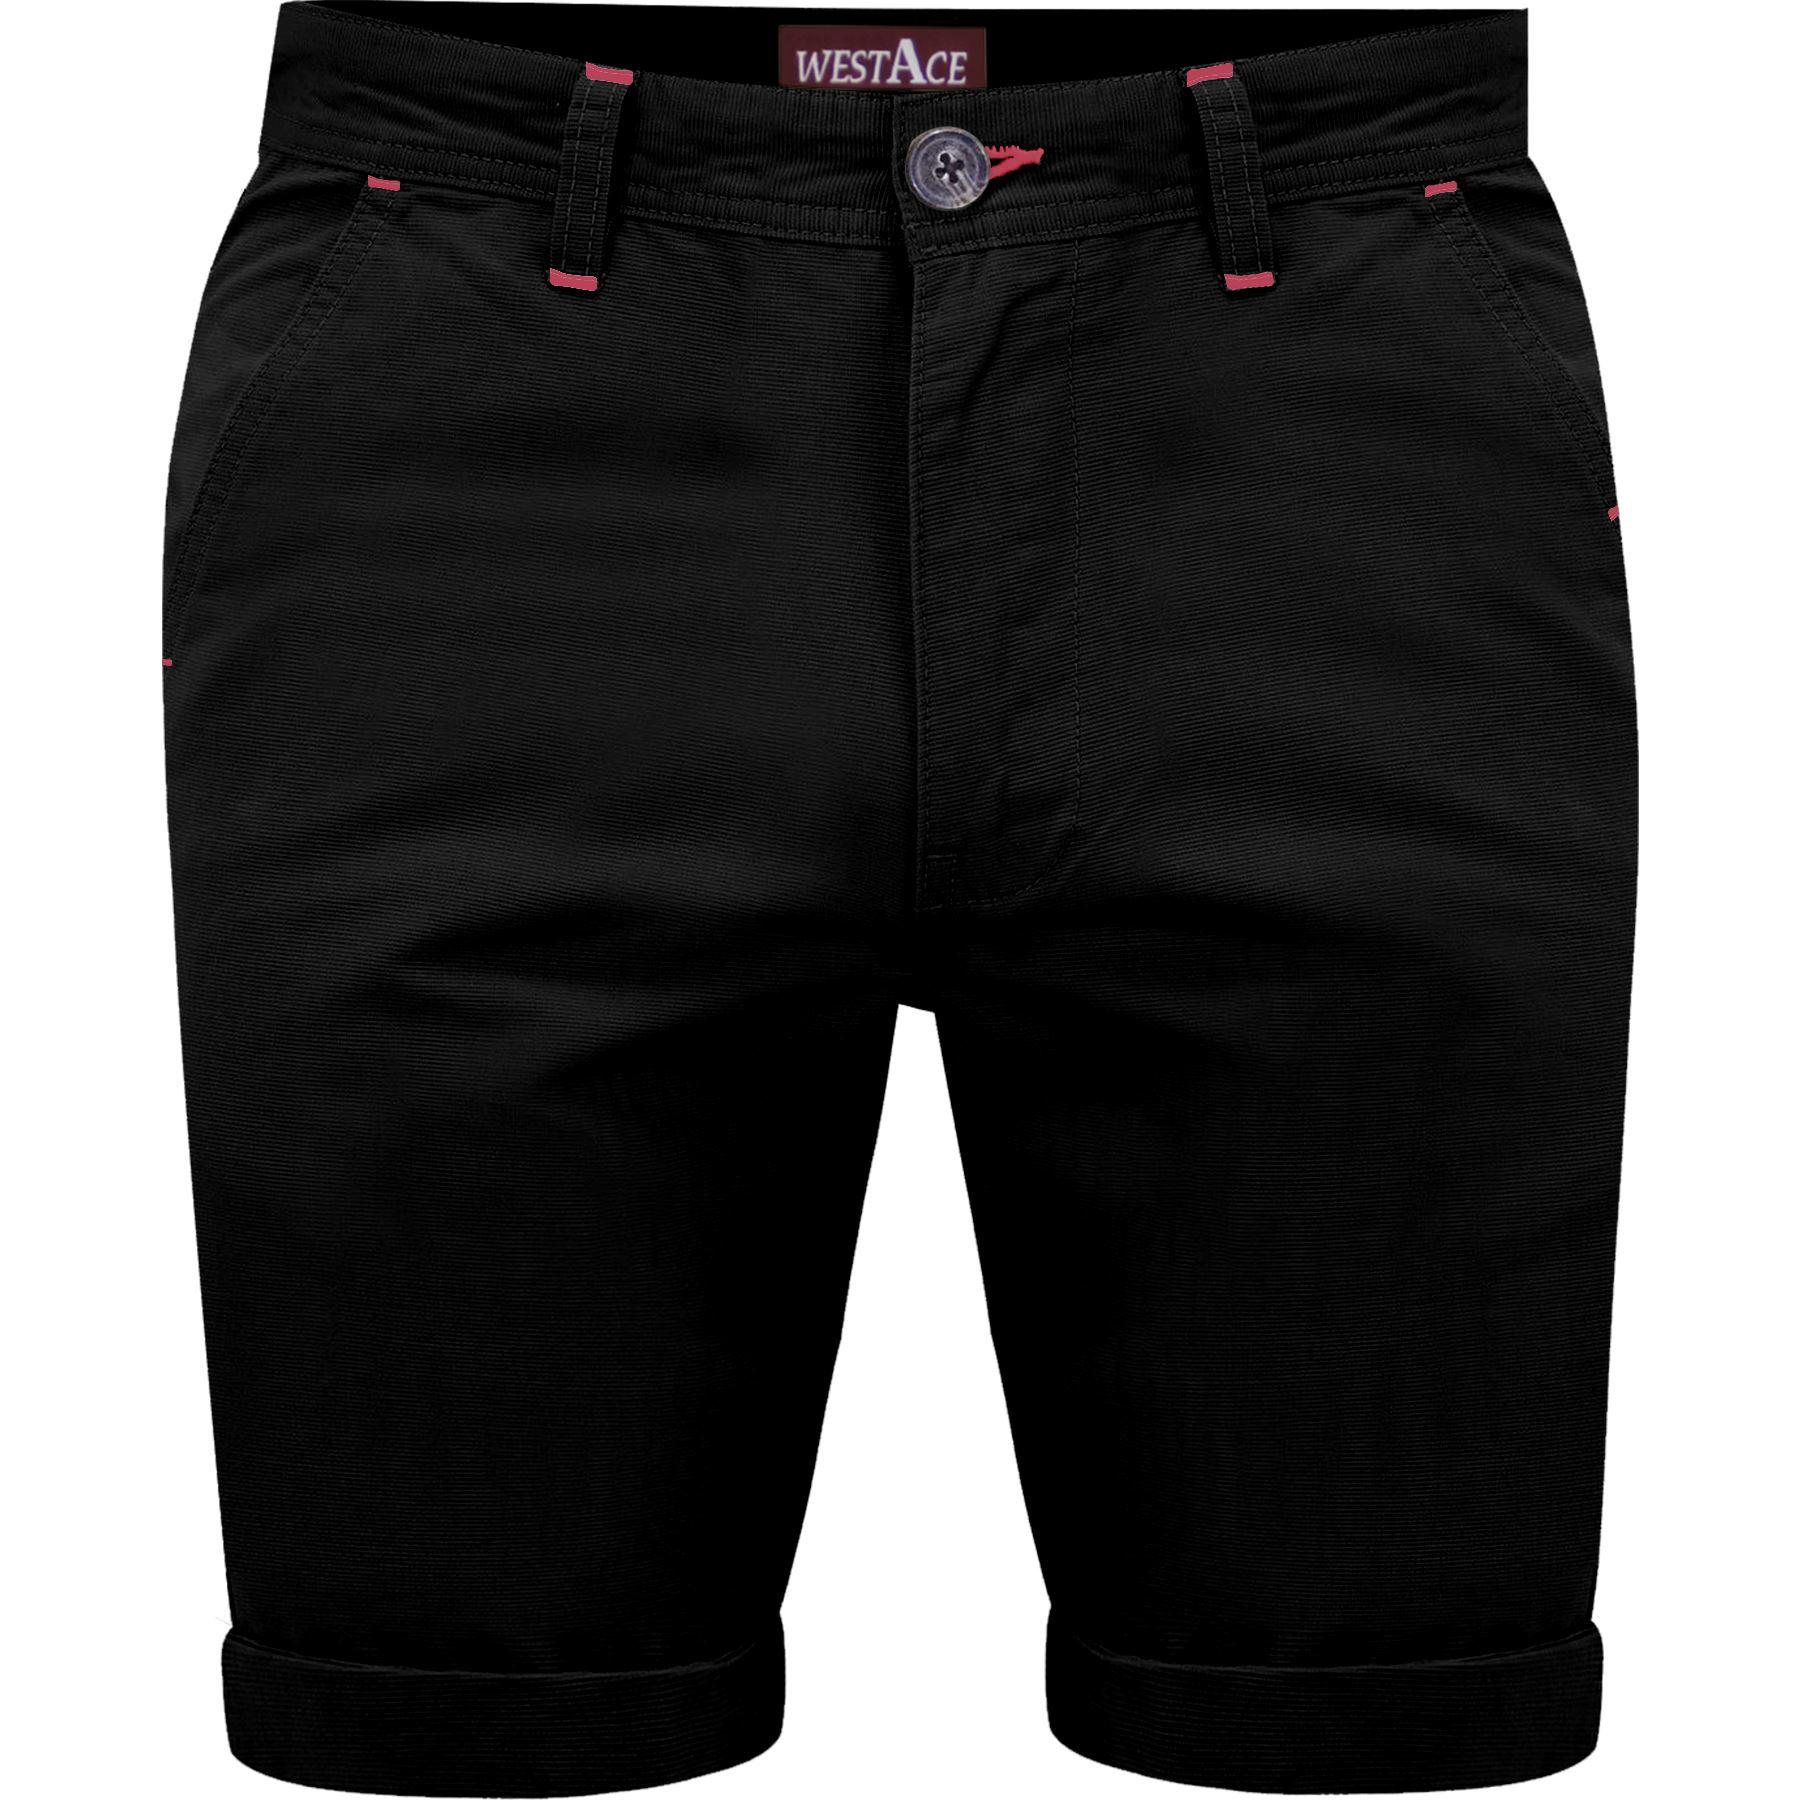 Mens 2 Pack Chino Shorts Cotton Multi Pack Half Pant Casual Gift Set Designer